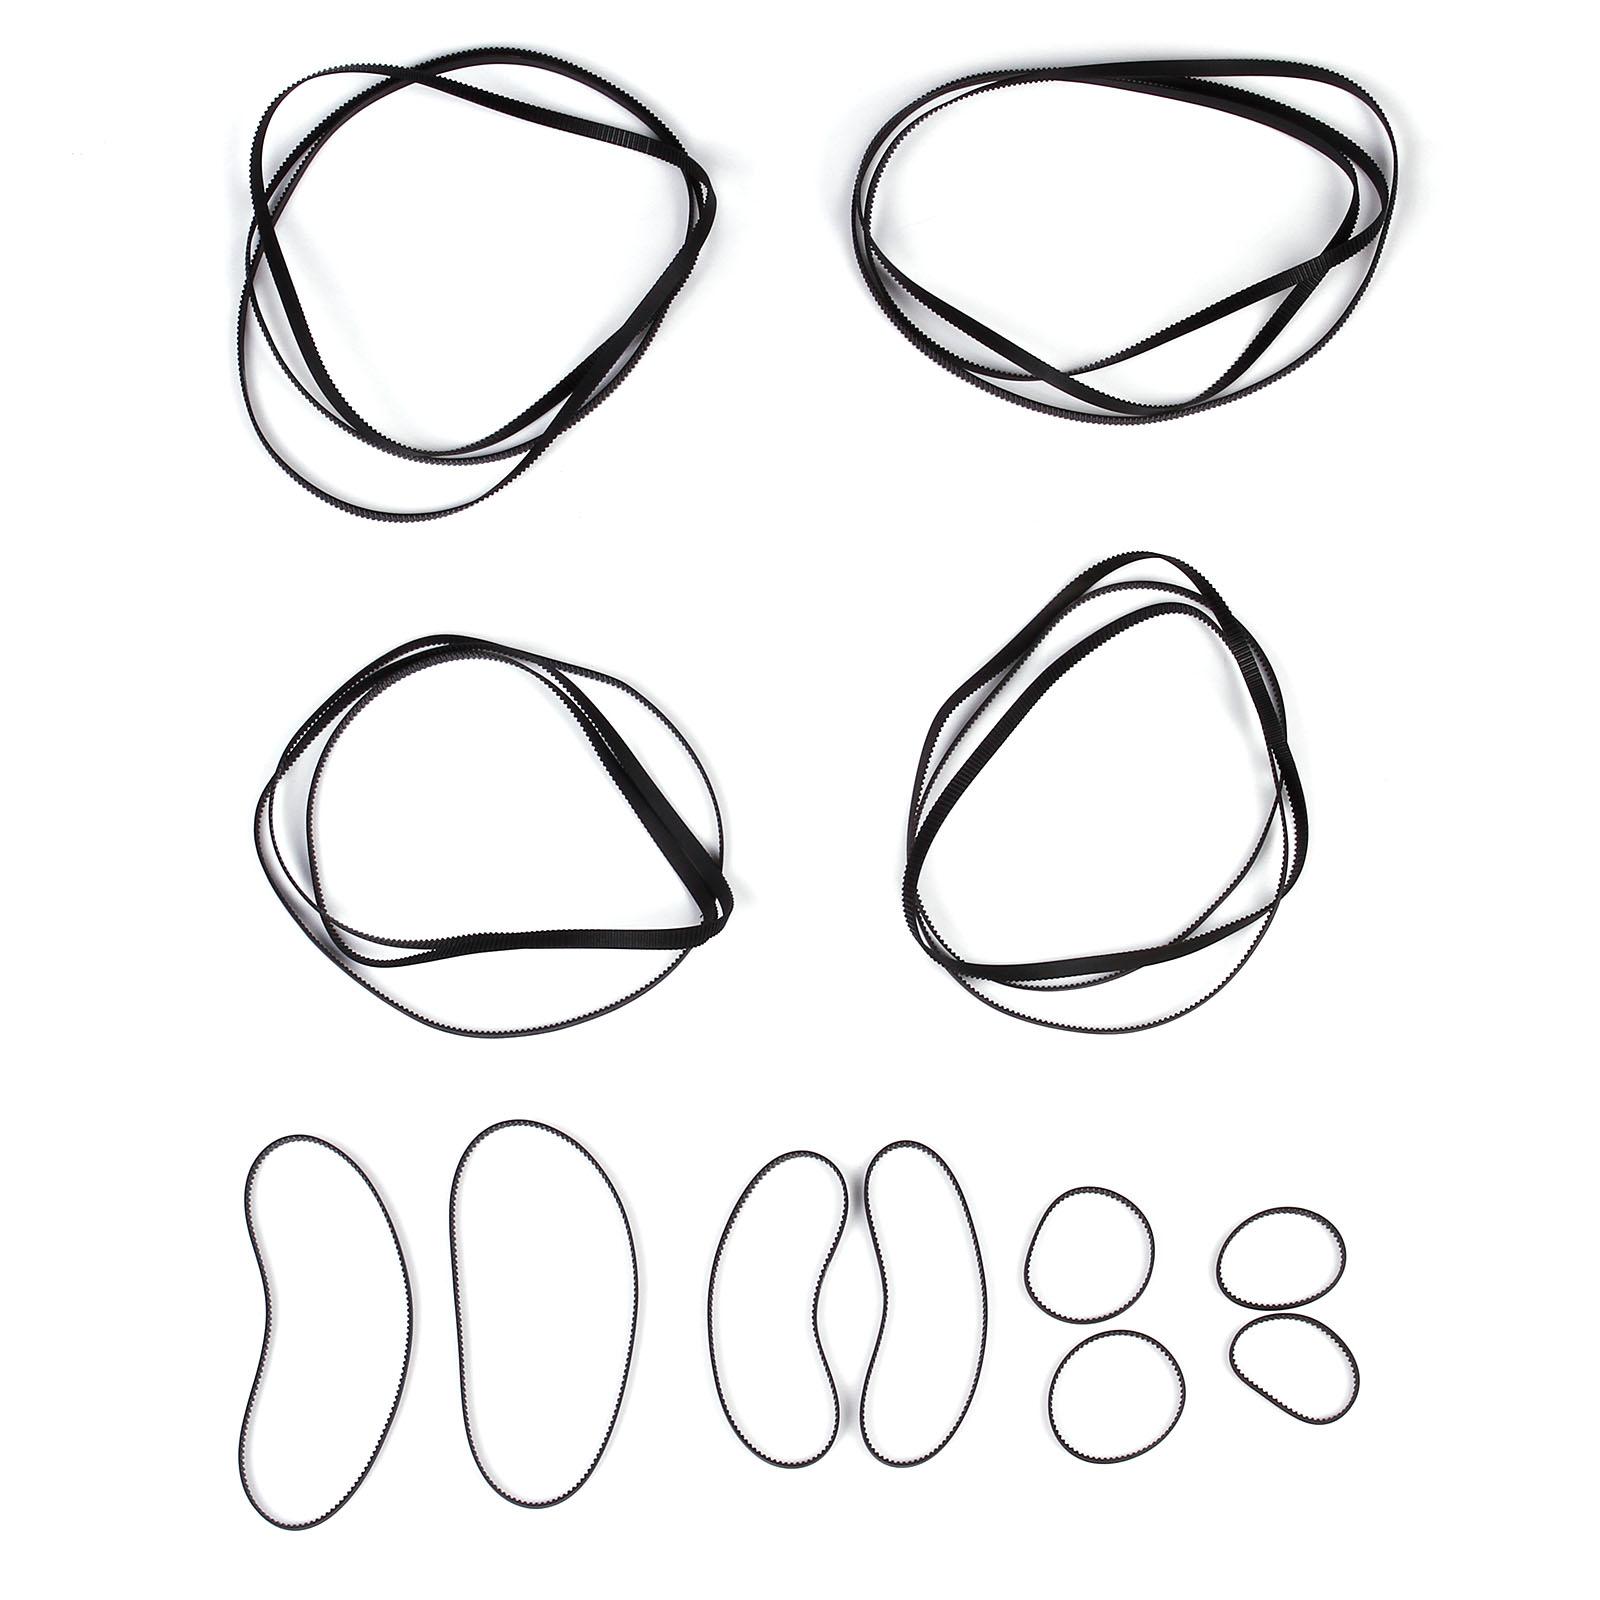 rubber closed loop timing belt for cnc 3d printing 61